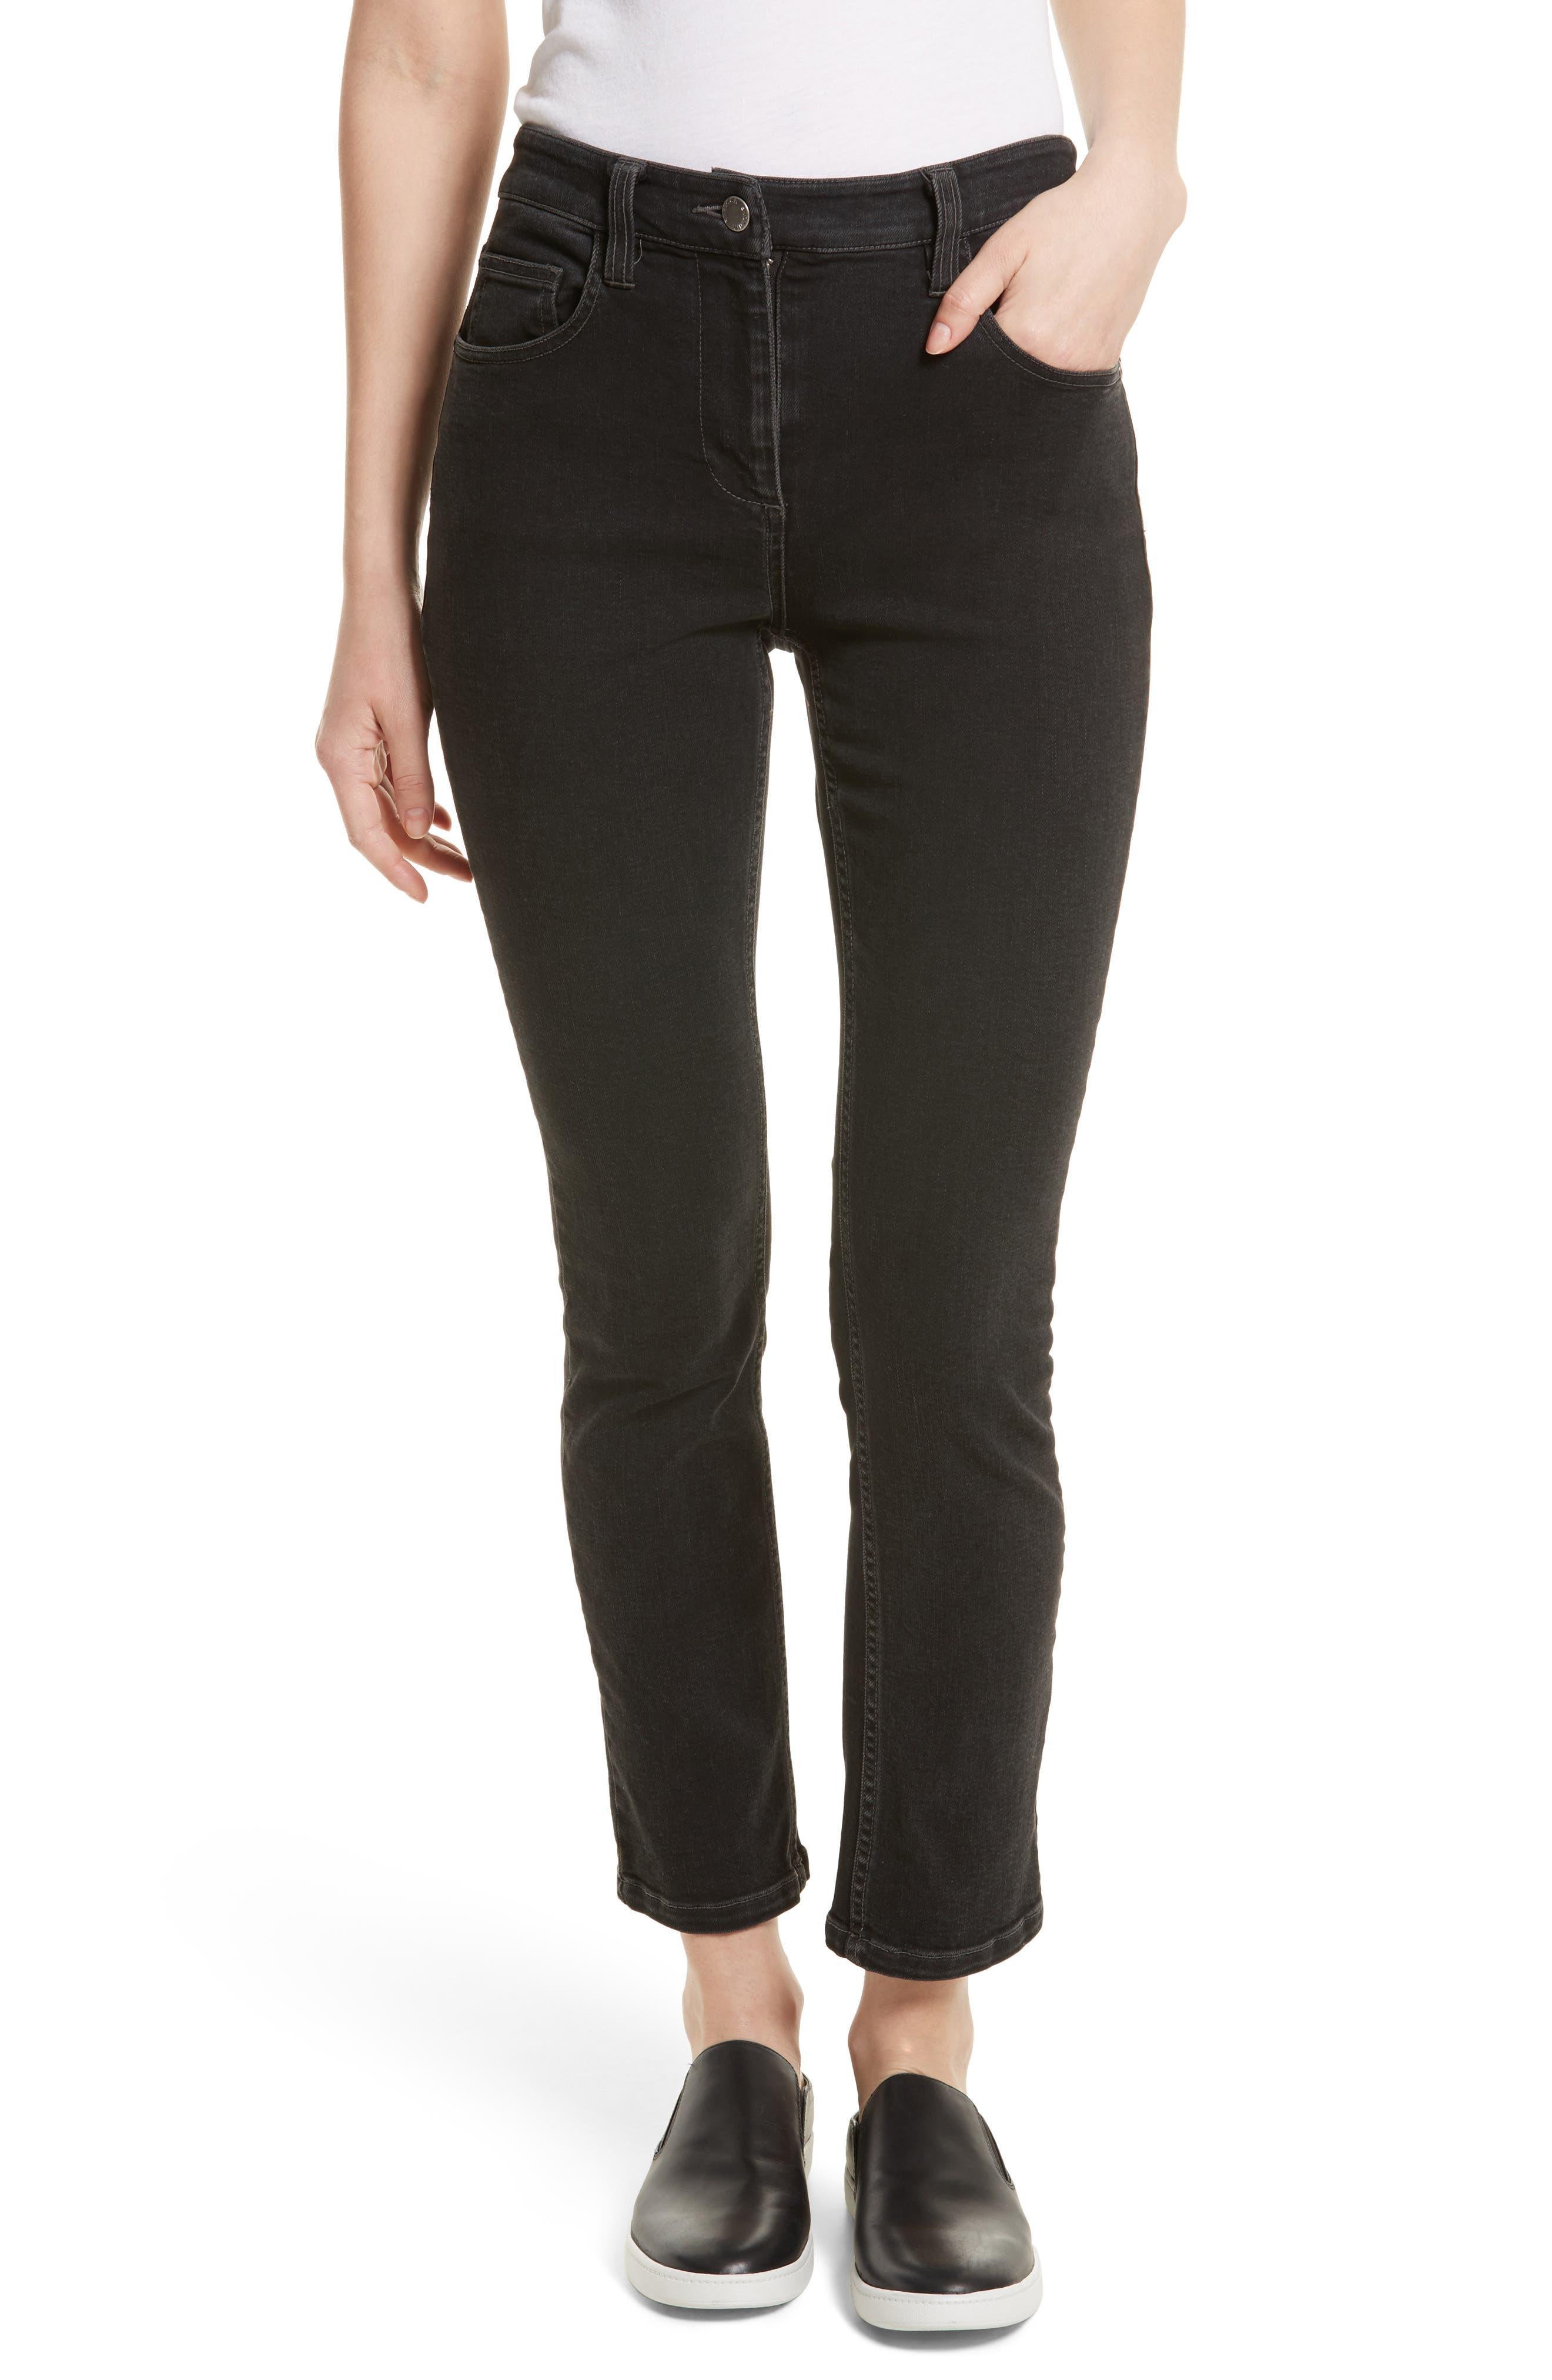 Rebecca Minkoff Marigold Straight Leg Jeans